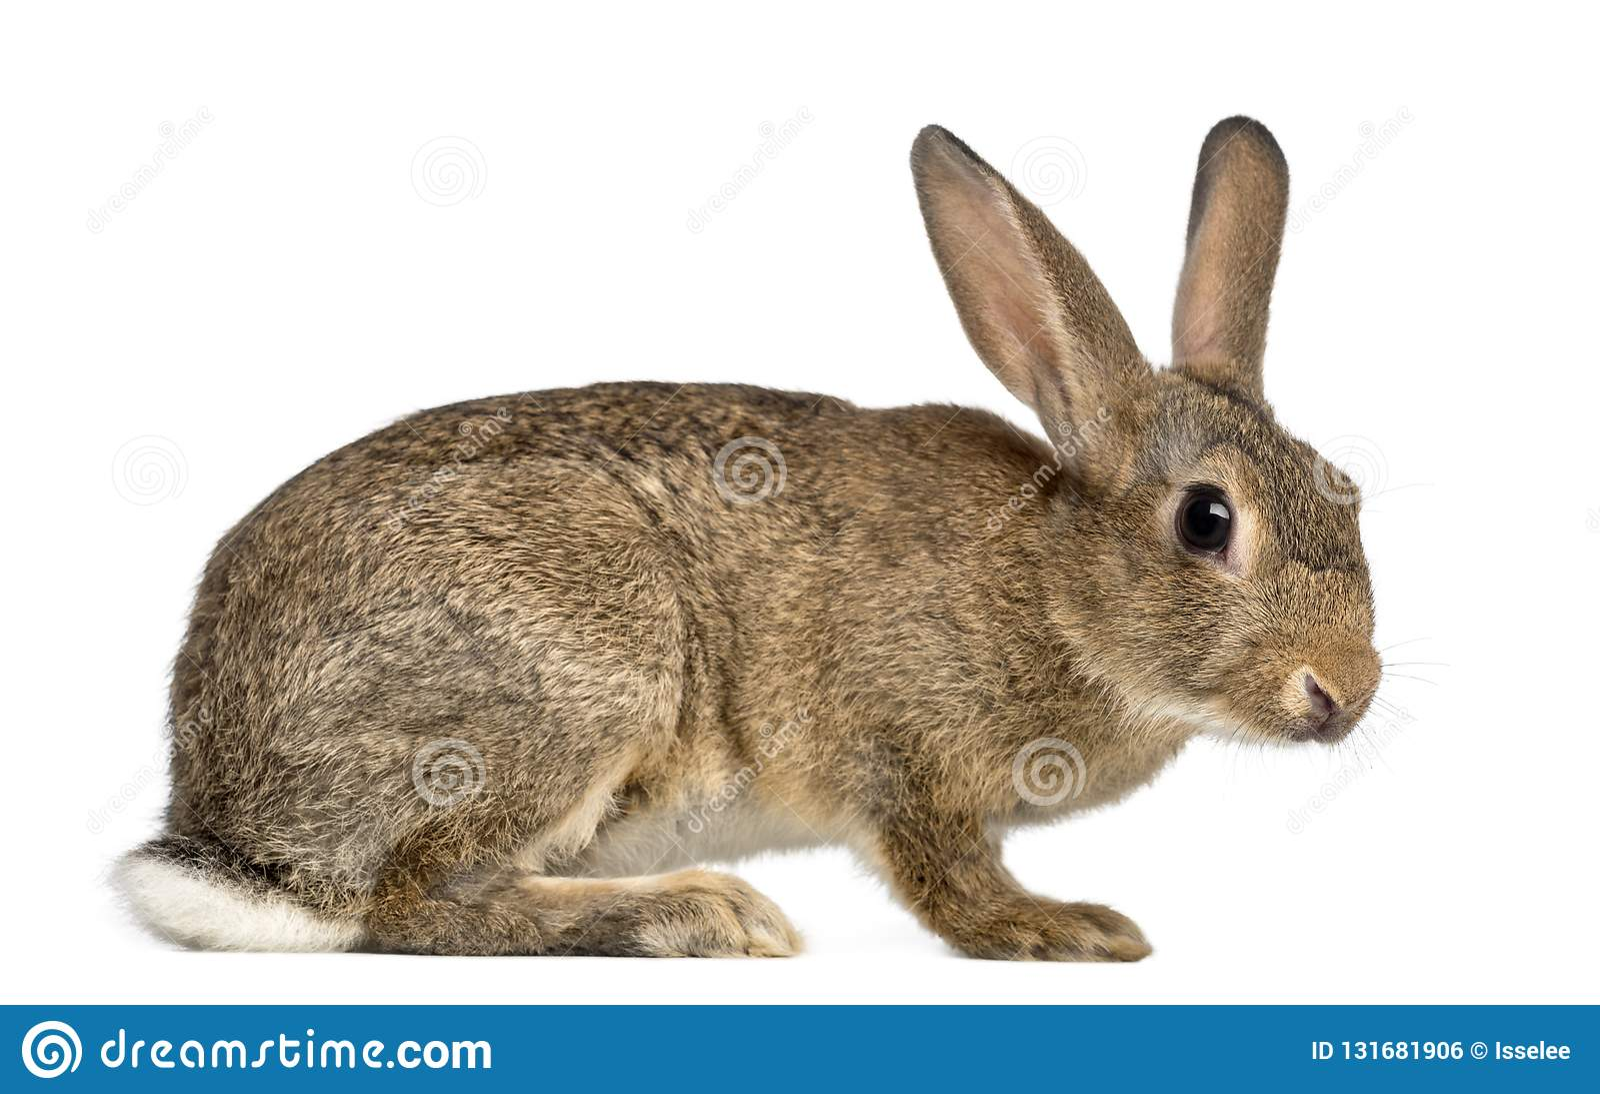 European rabbit or common rabbit, 3 months old